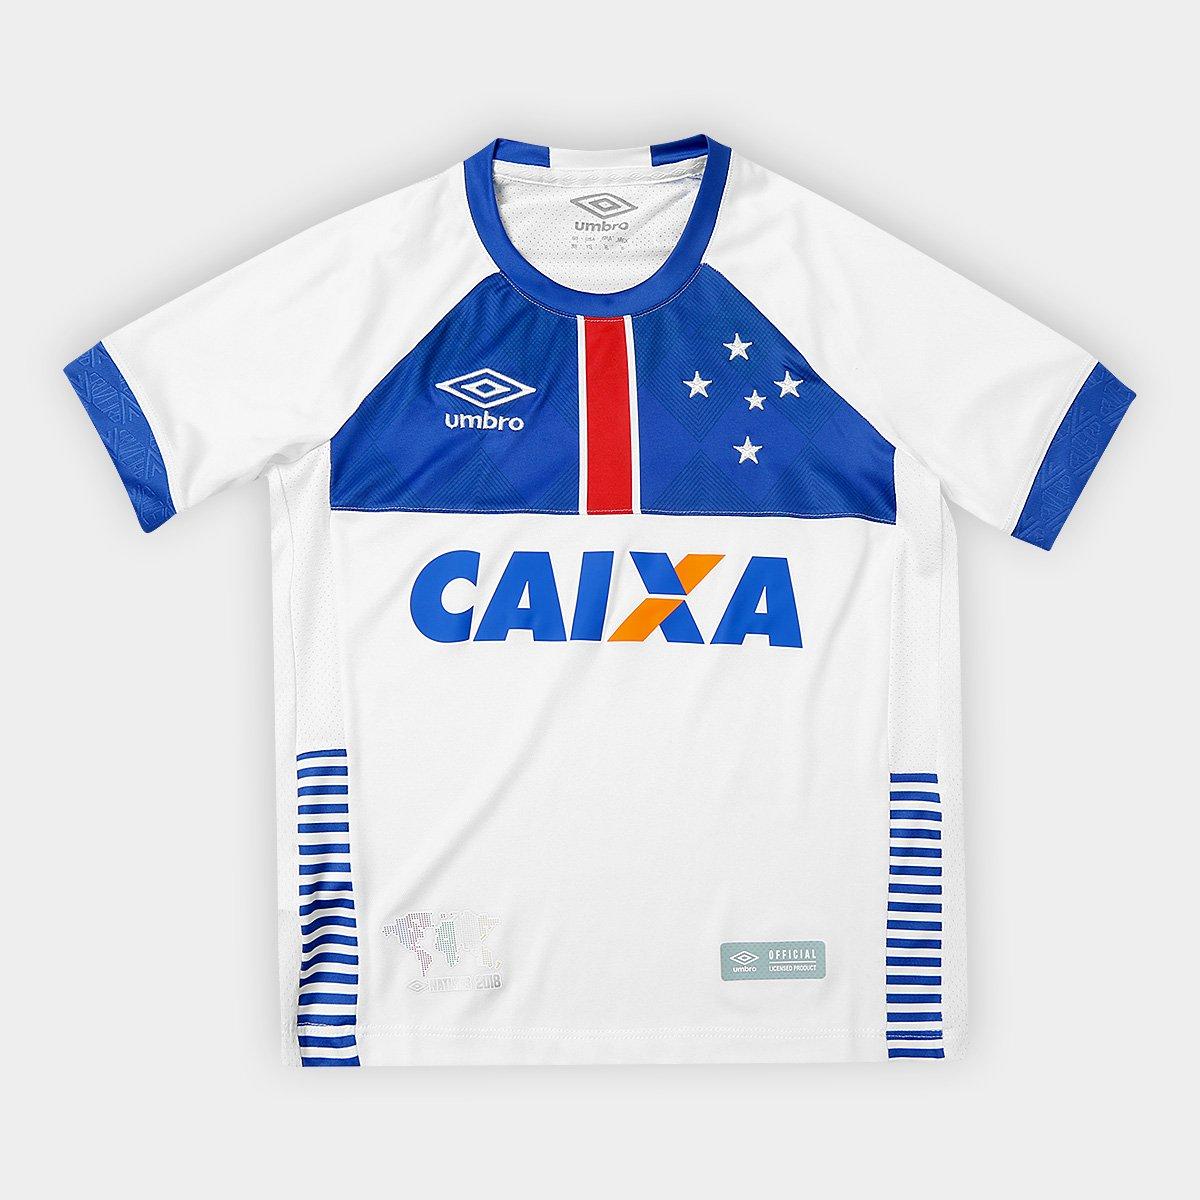 e632cb9407a18 Camisa Cruzeiro Infantil II 2018 s n° C  Patrocínio Blaa Vikingur Torcedor  Umbro - Branco e Azul - Compre Agora